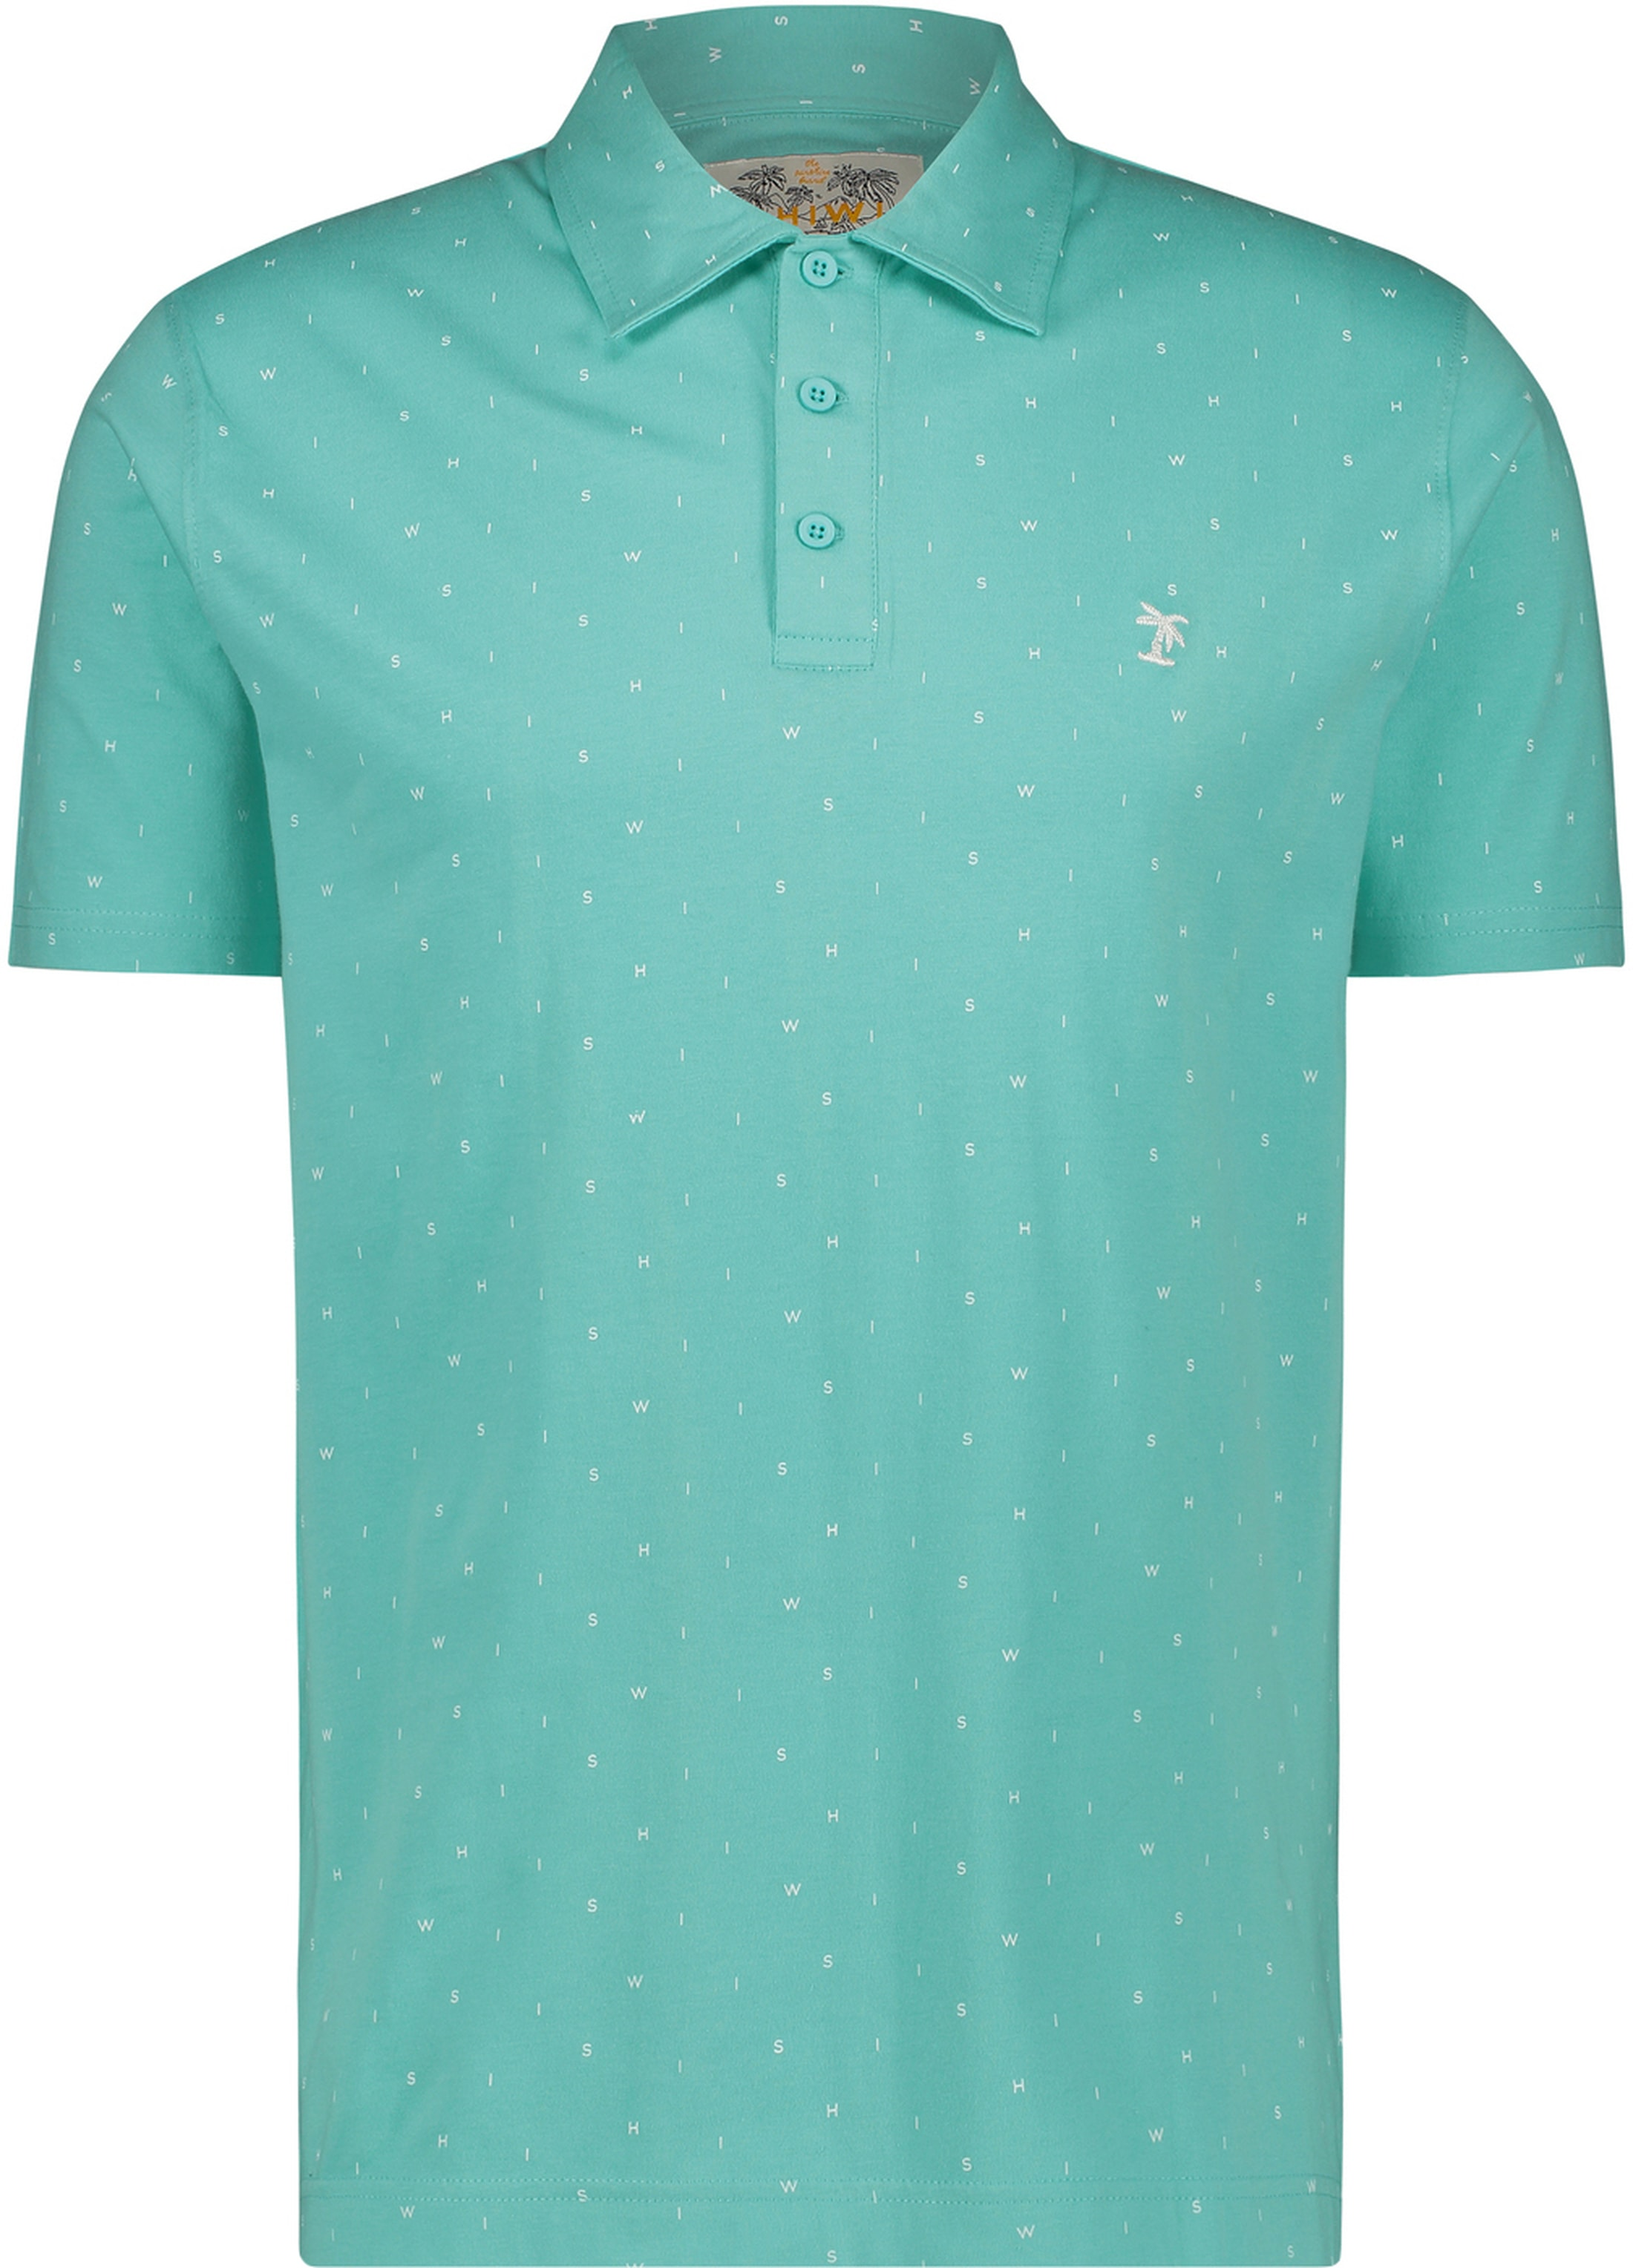 Shiwi Poloshirt Minishiwi Turquoise foto 0